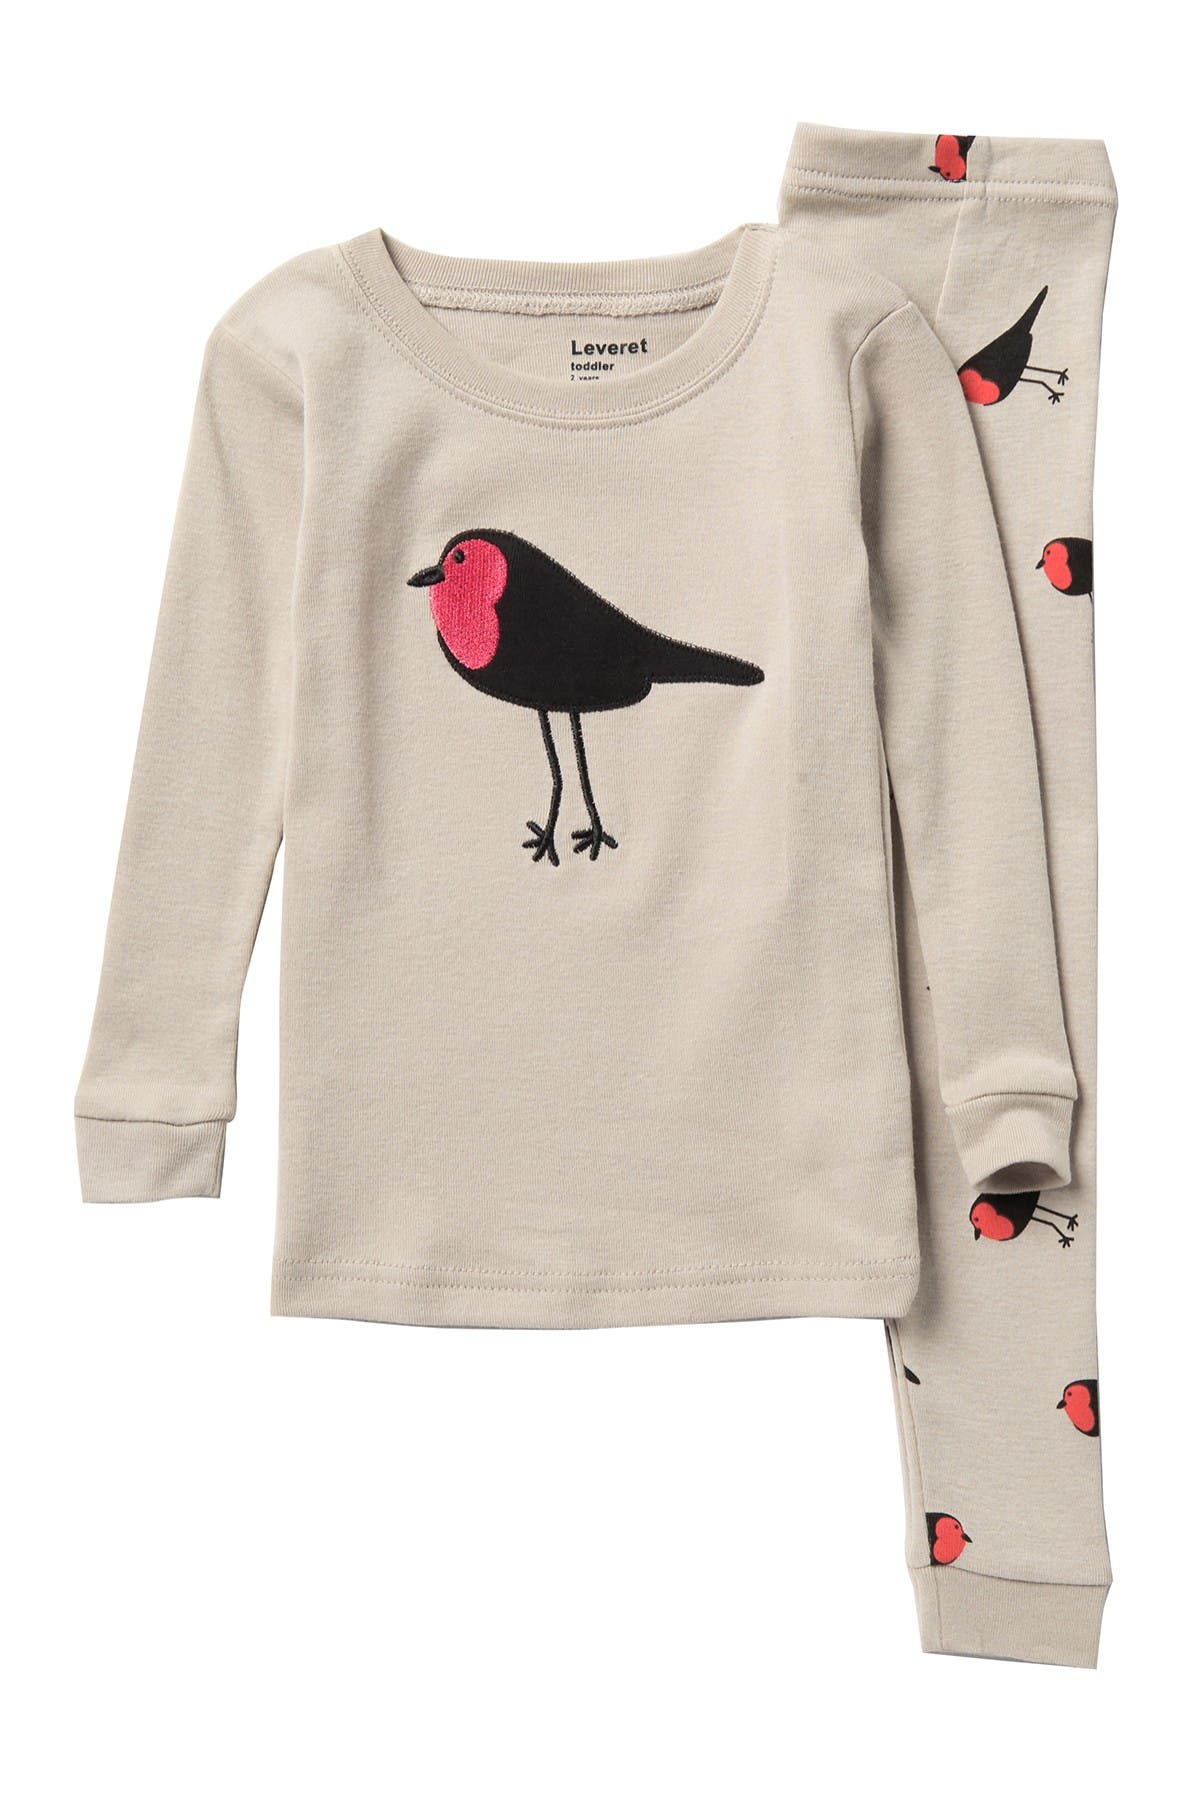 Image of Leveret Bird Pajama Set